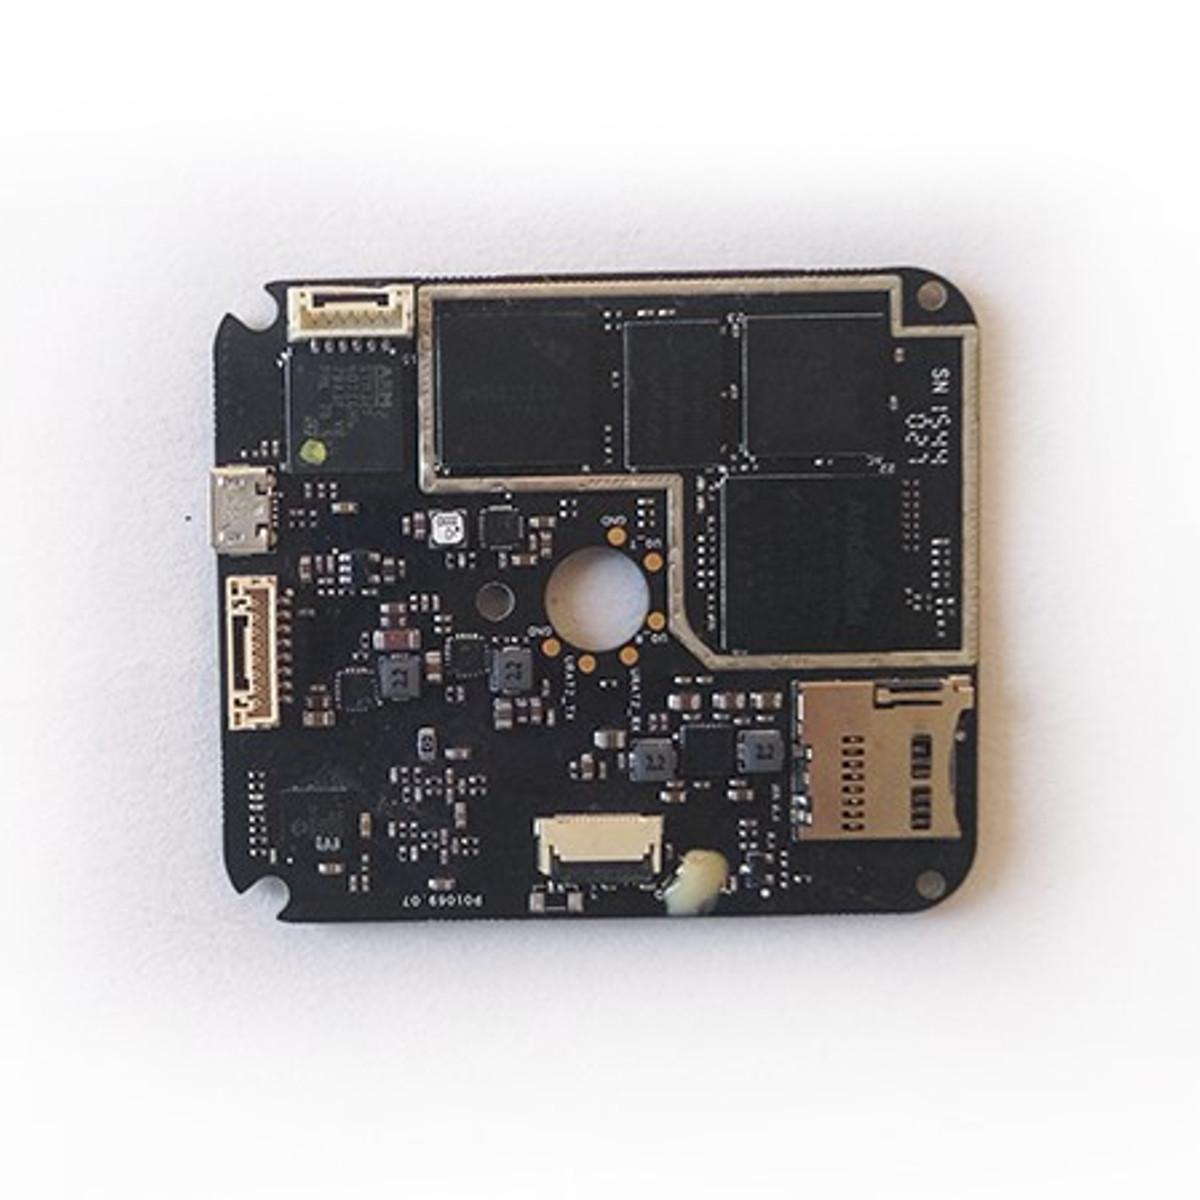 Gimbal Mainboard Circuit Board RC Quadcopter Parts for DJI Phantom 3 Pro